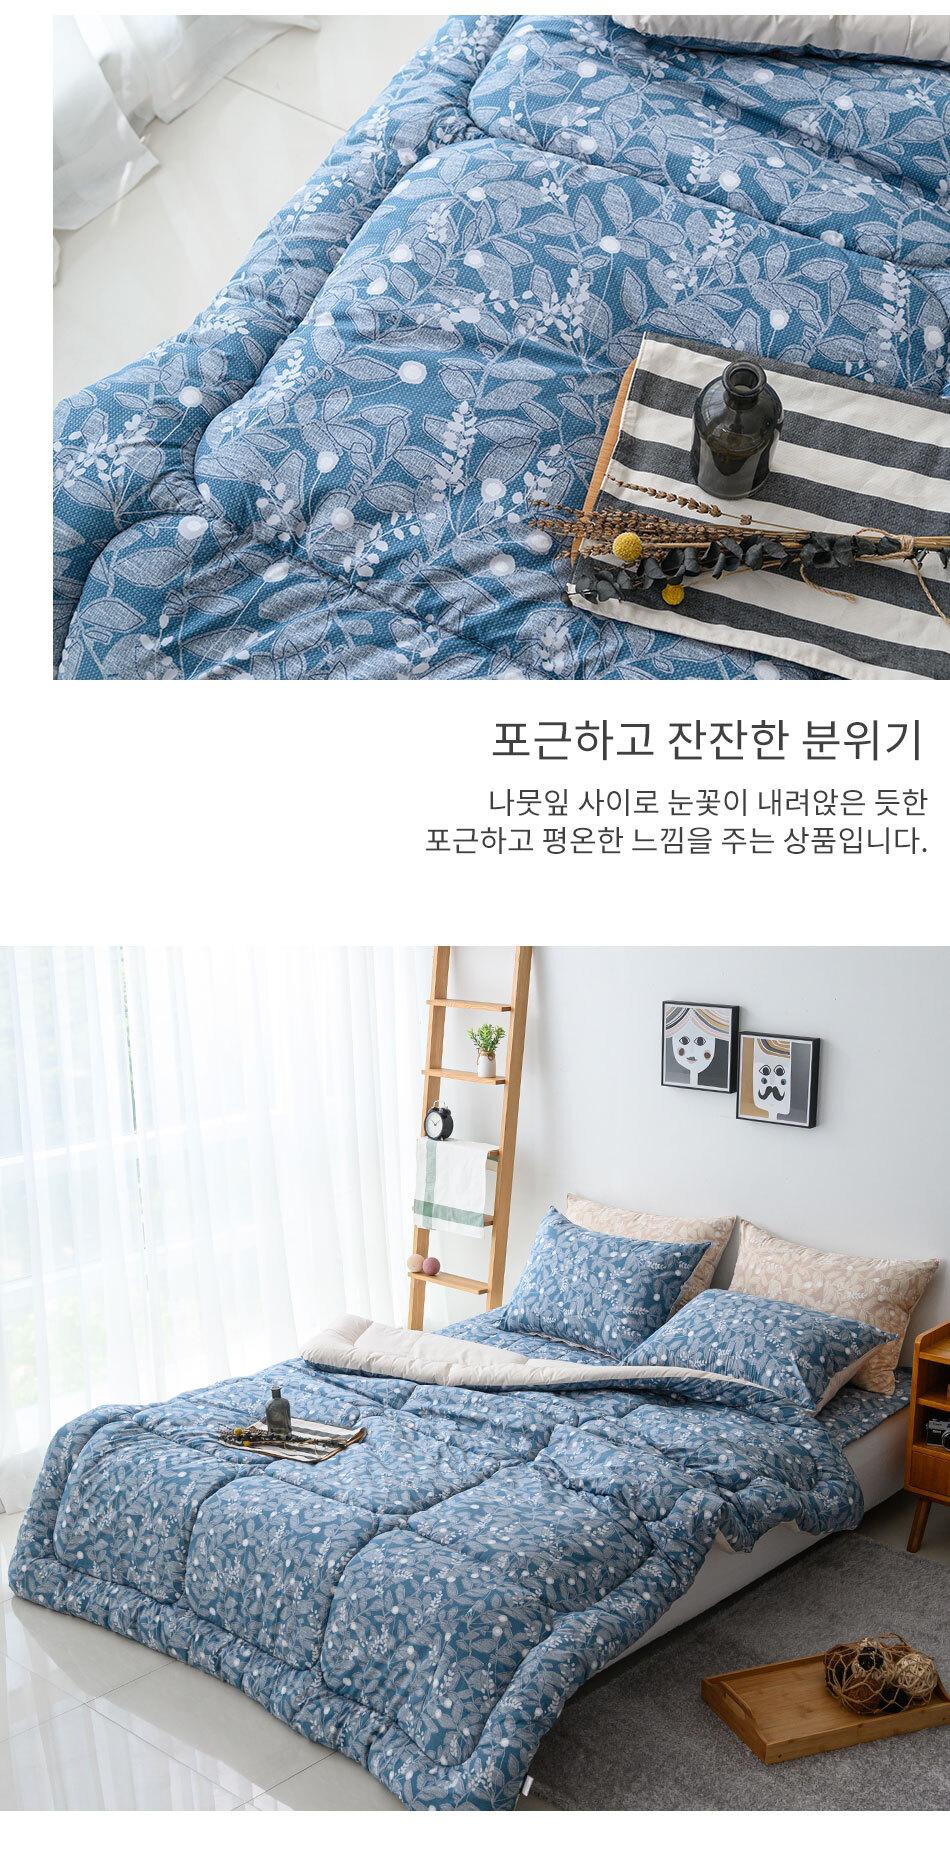 kassy_bed_blue_02.jpg